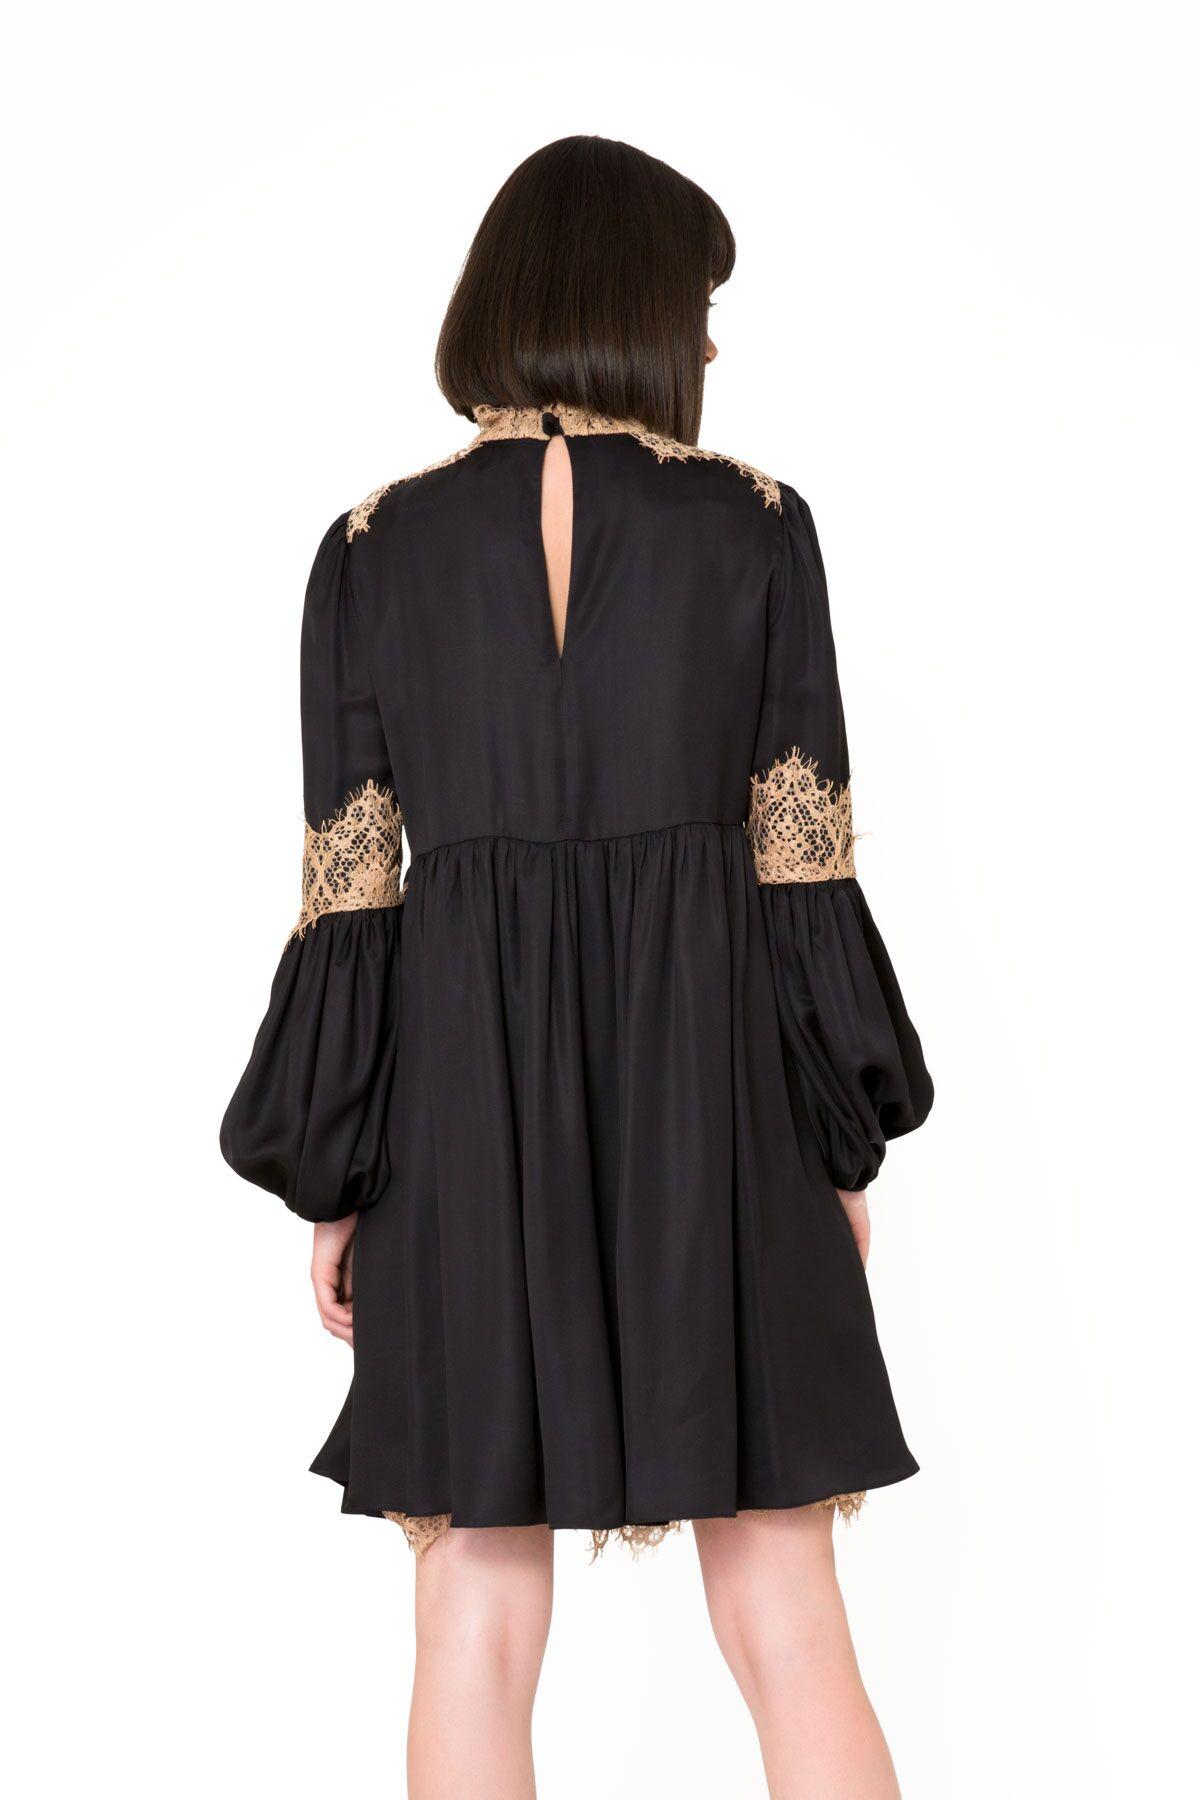 Dantel Detaylı Siyah Midi Elbise